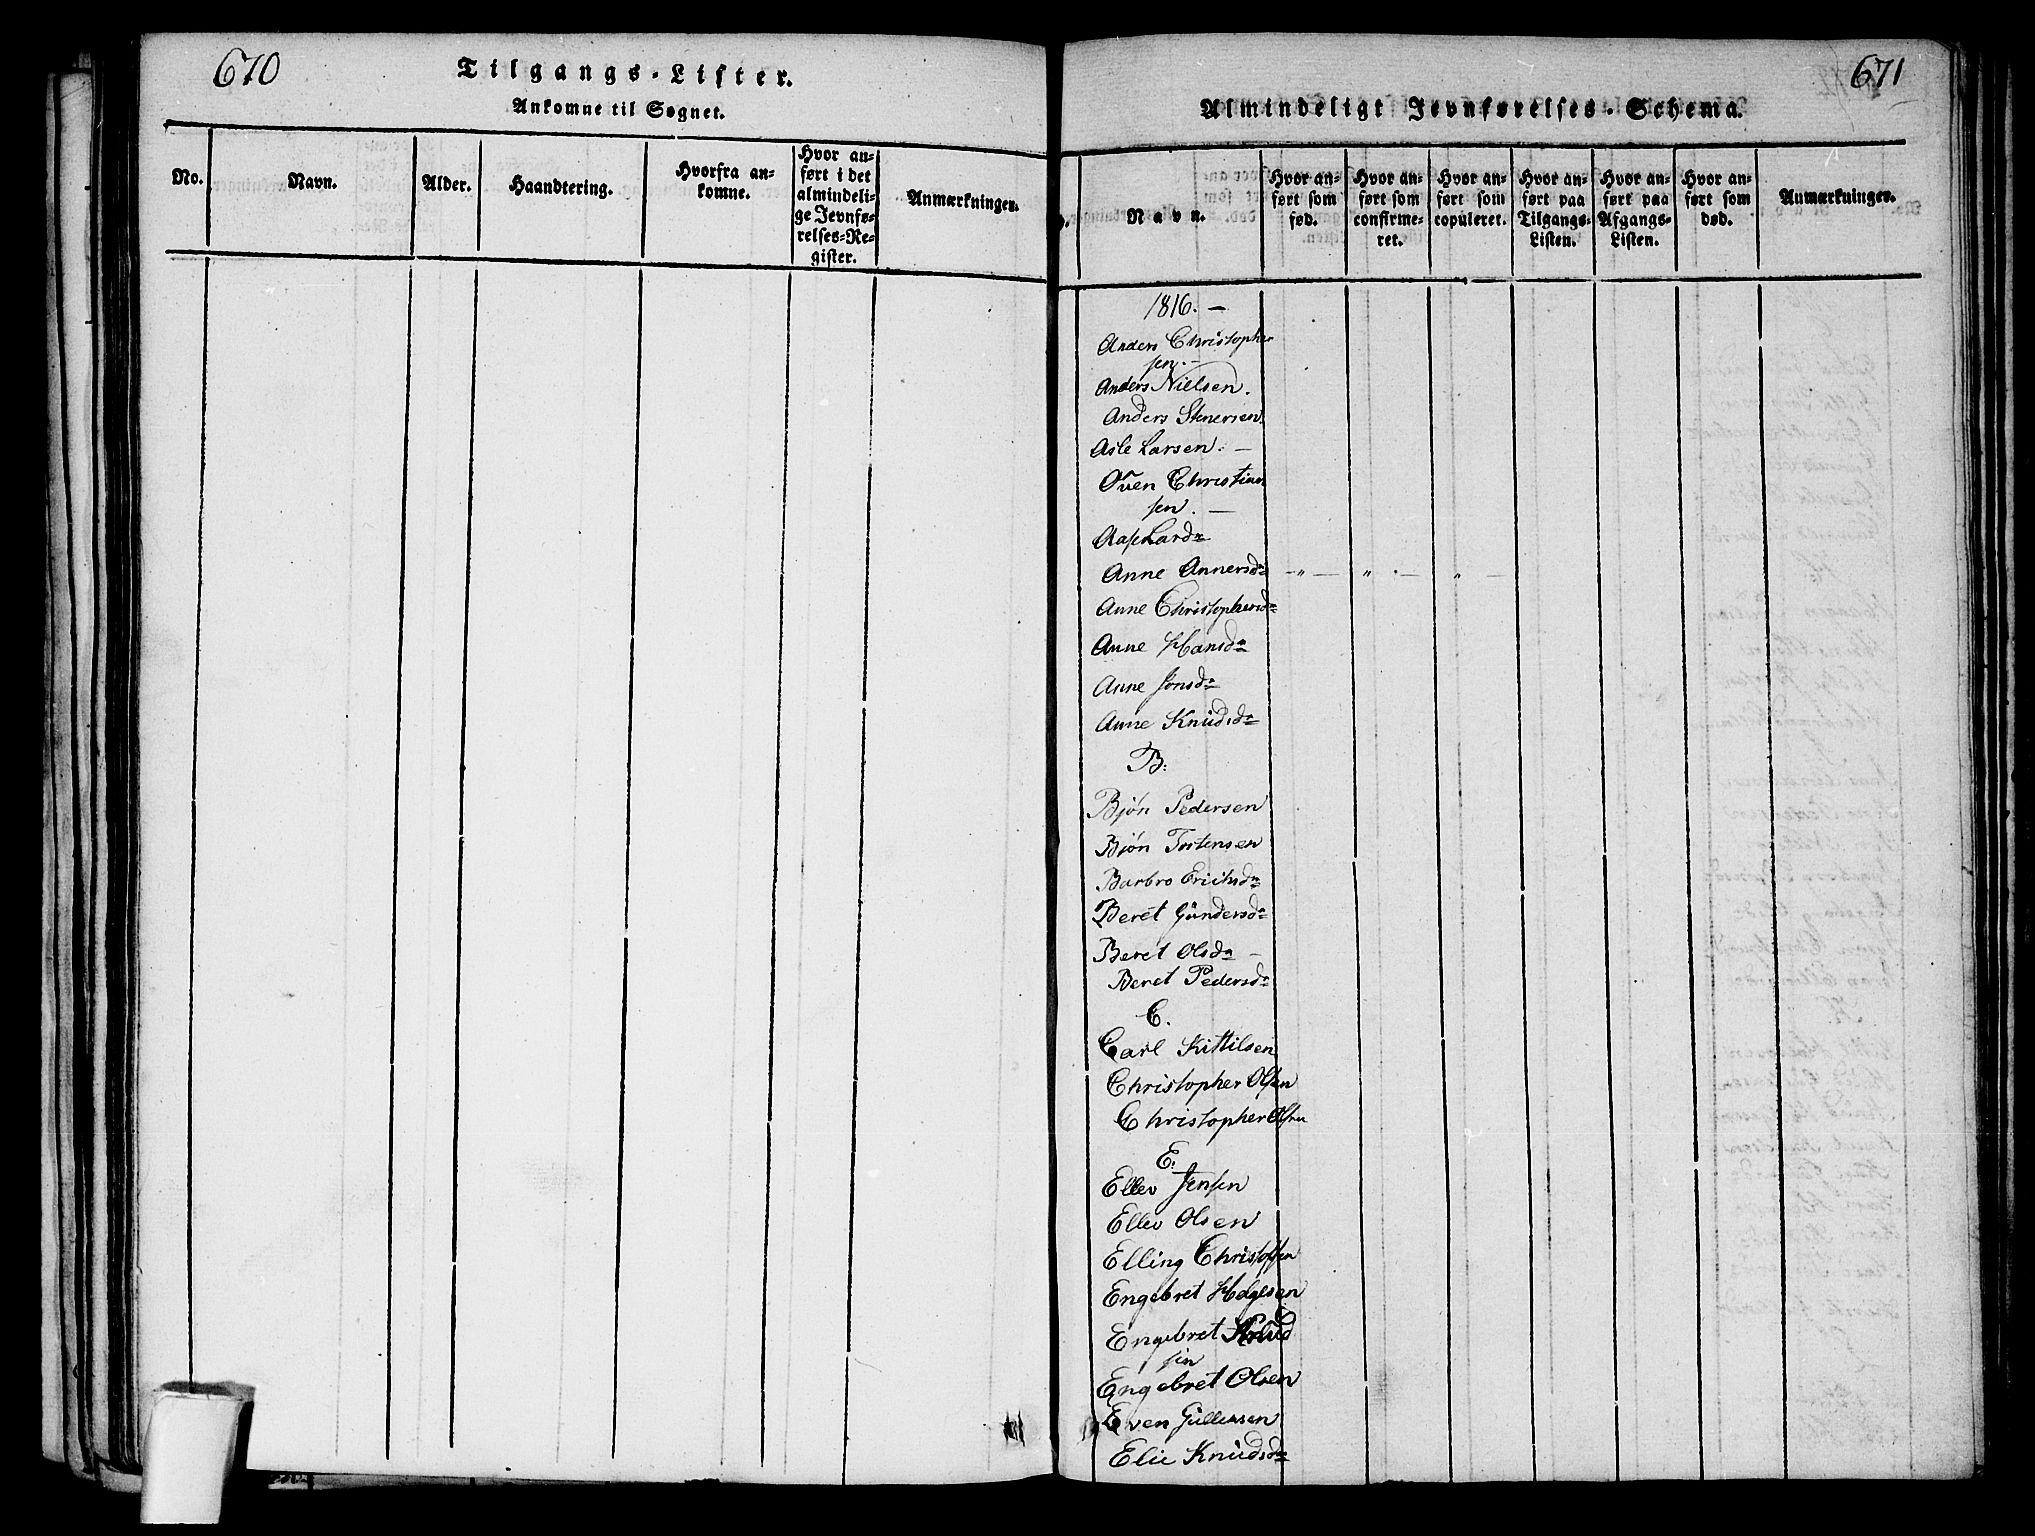 SAKO, Sigdal kirkebøker, G/Ga/L0001: Klokkerbok nr. I 1 /1, 1816-1835, s. 670-671